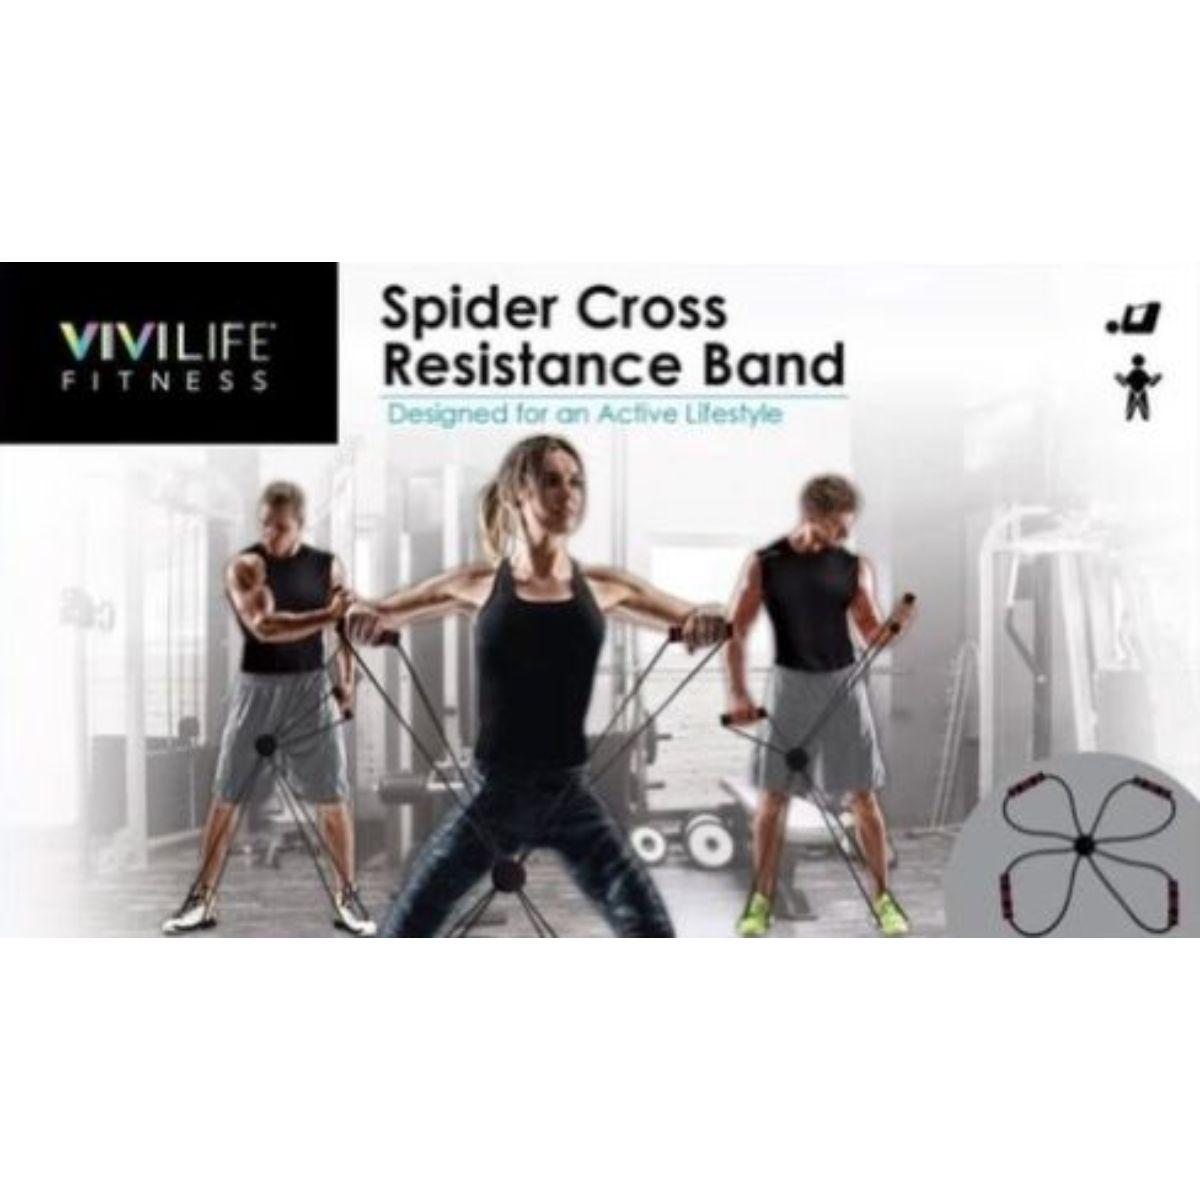 banda de resistencia cruzada de arana 1